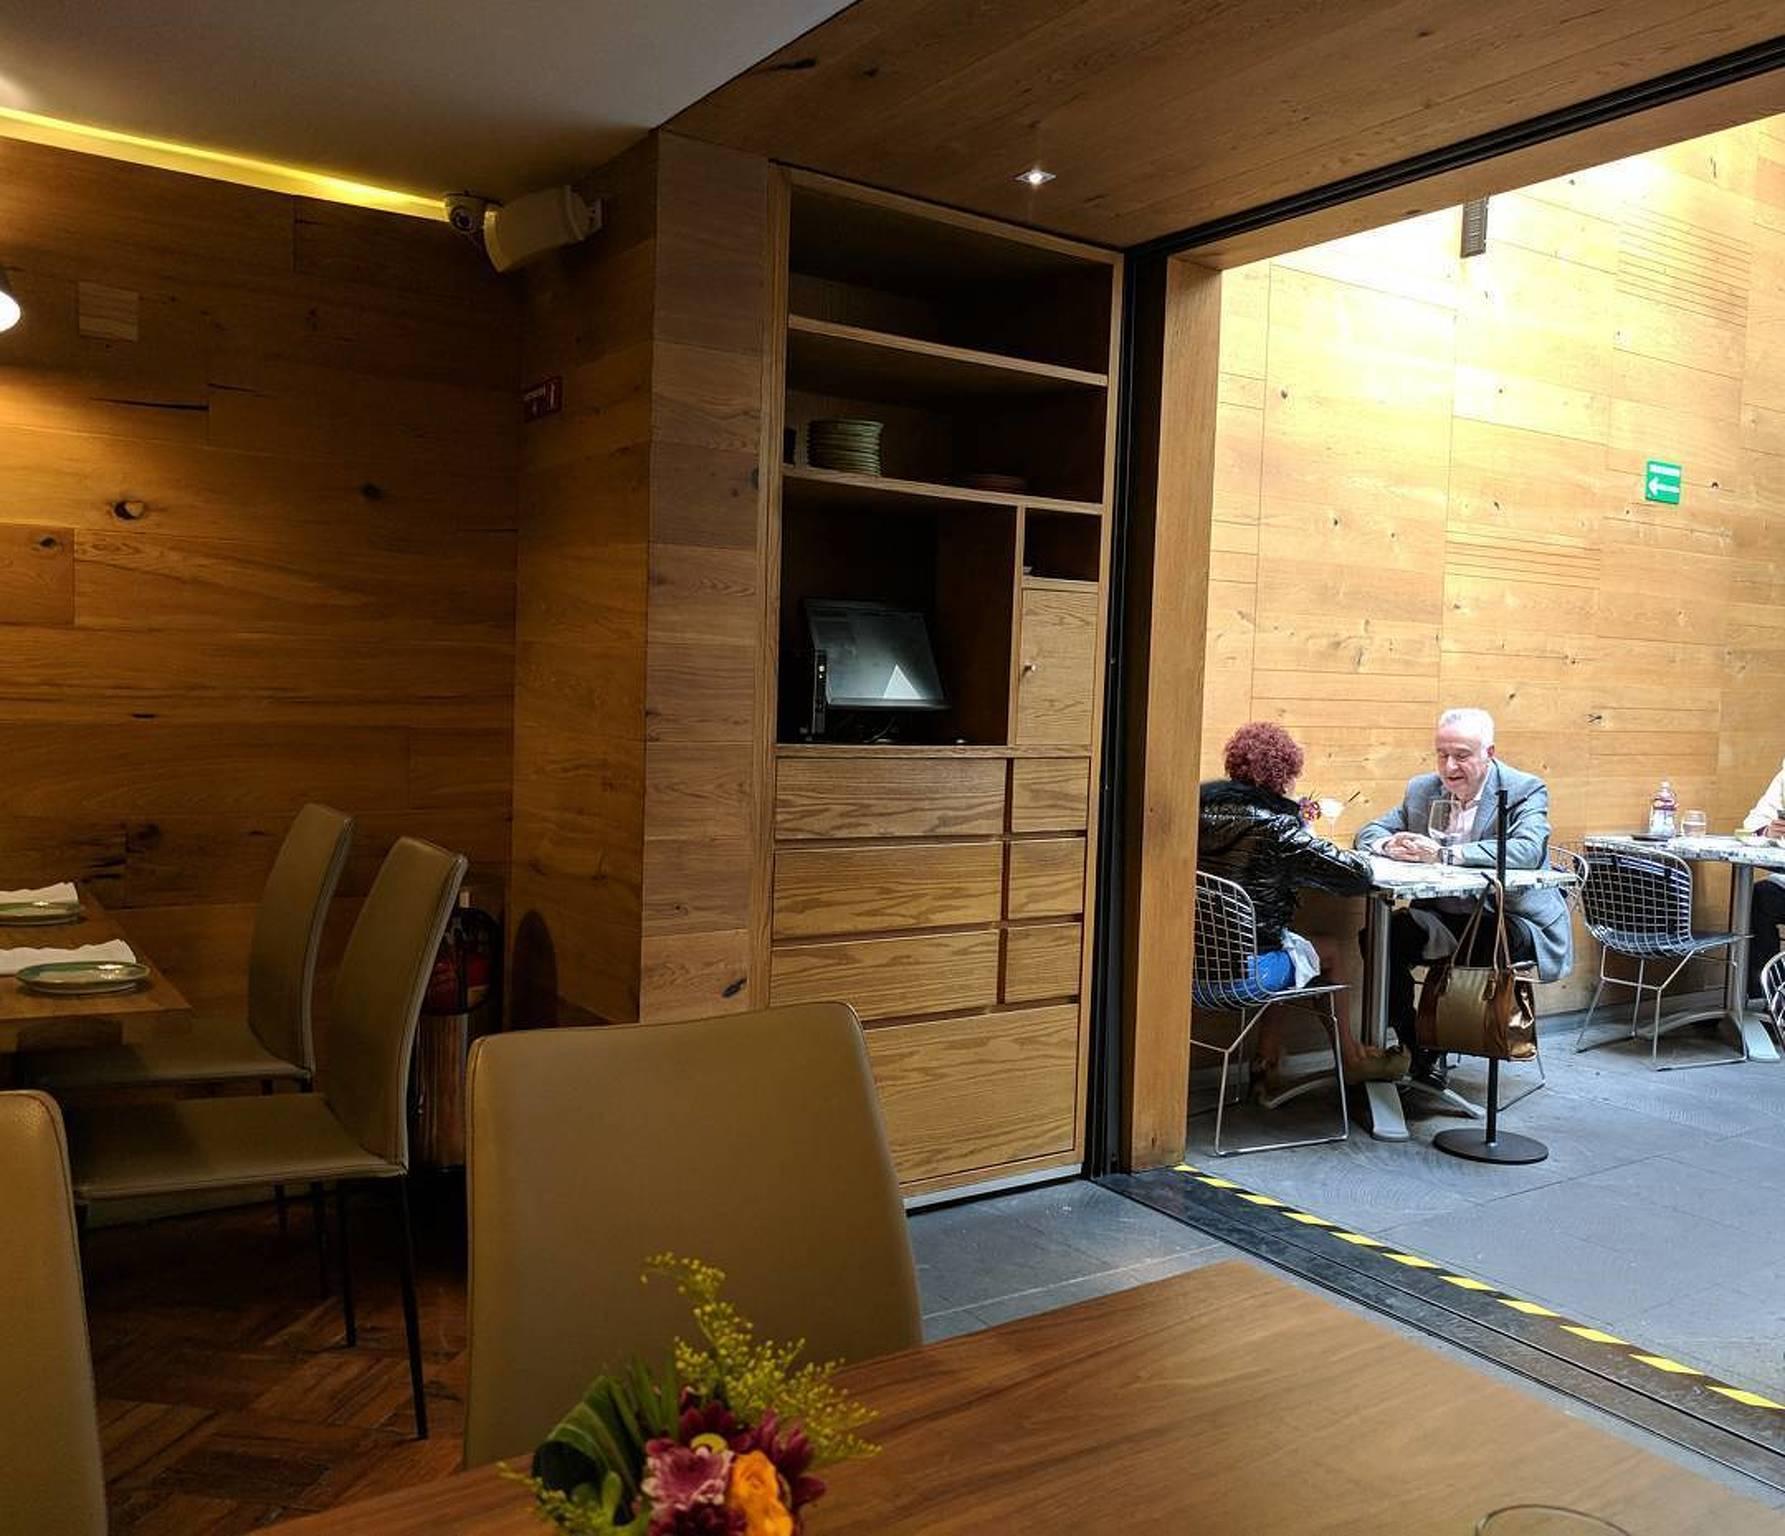 Quintonil, Mexico City | Reviews, Photos, Address, Phone Number | Foodle